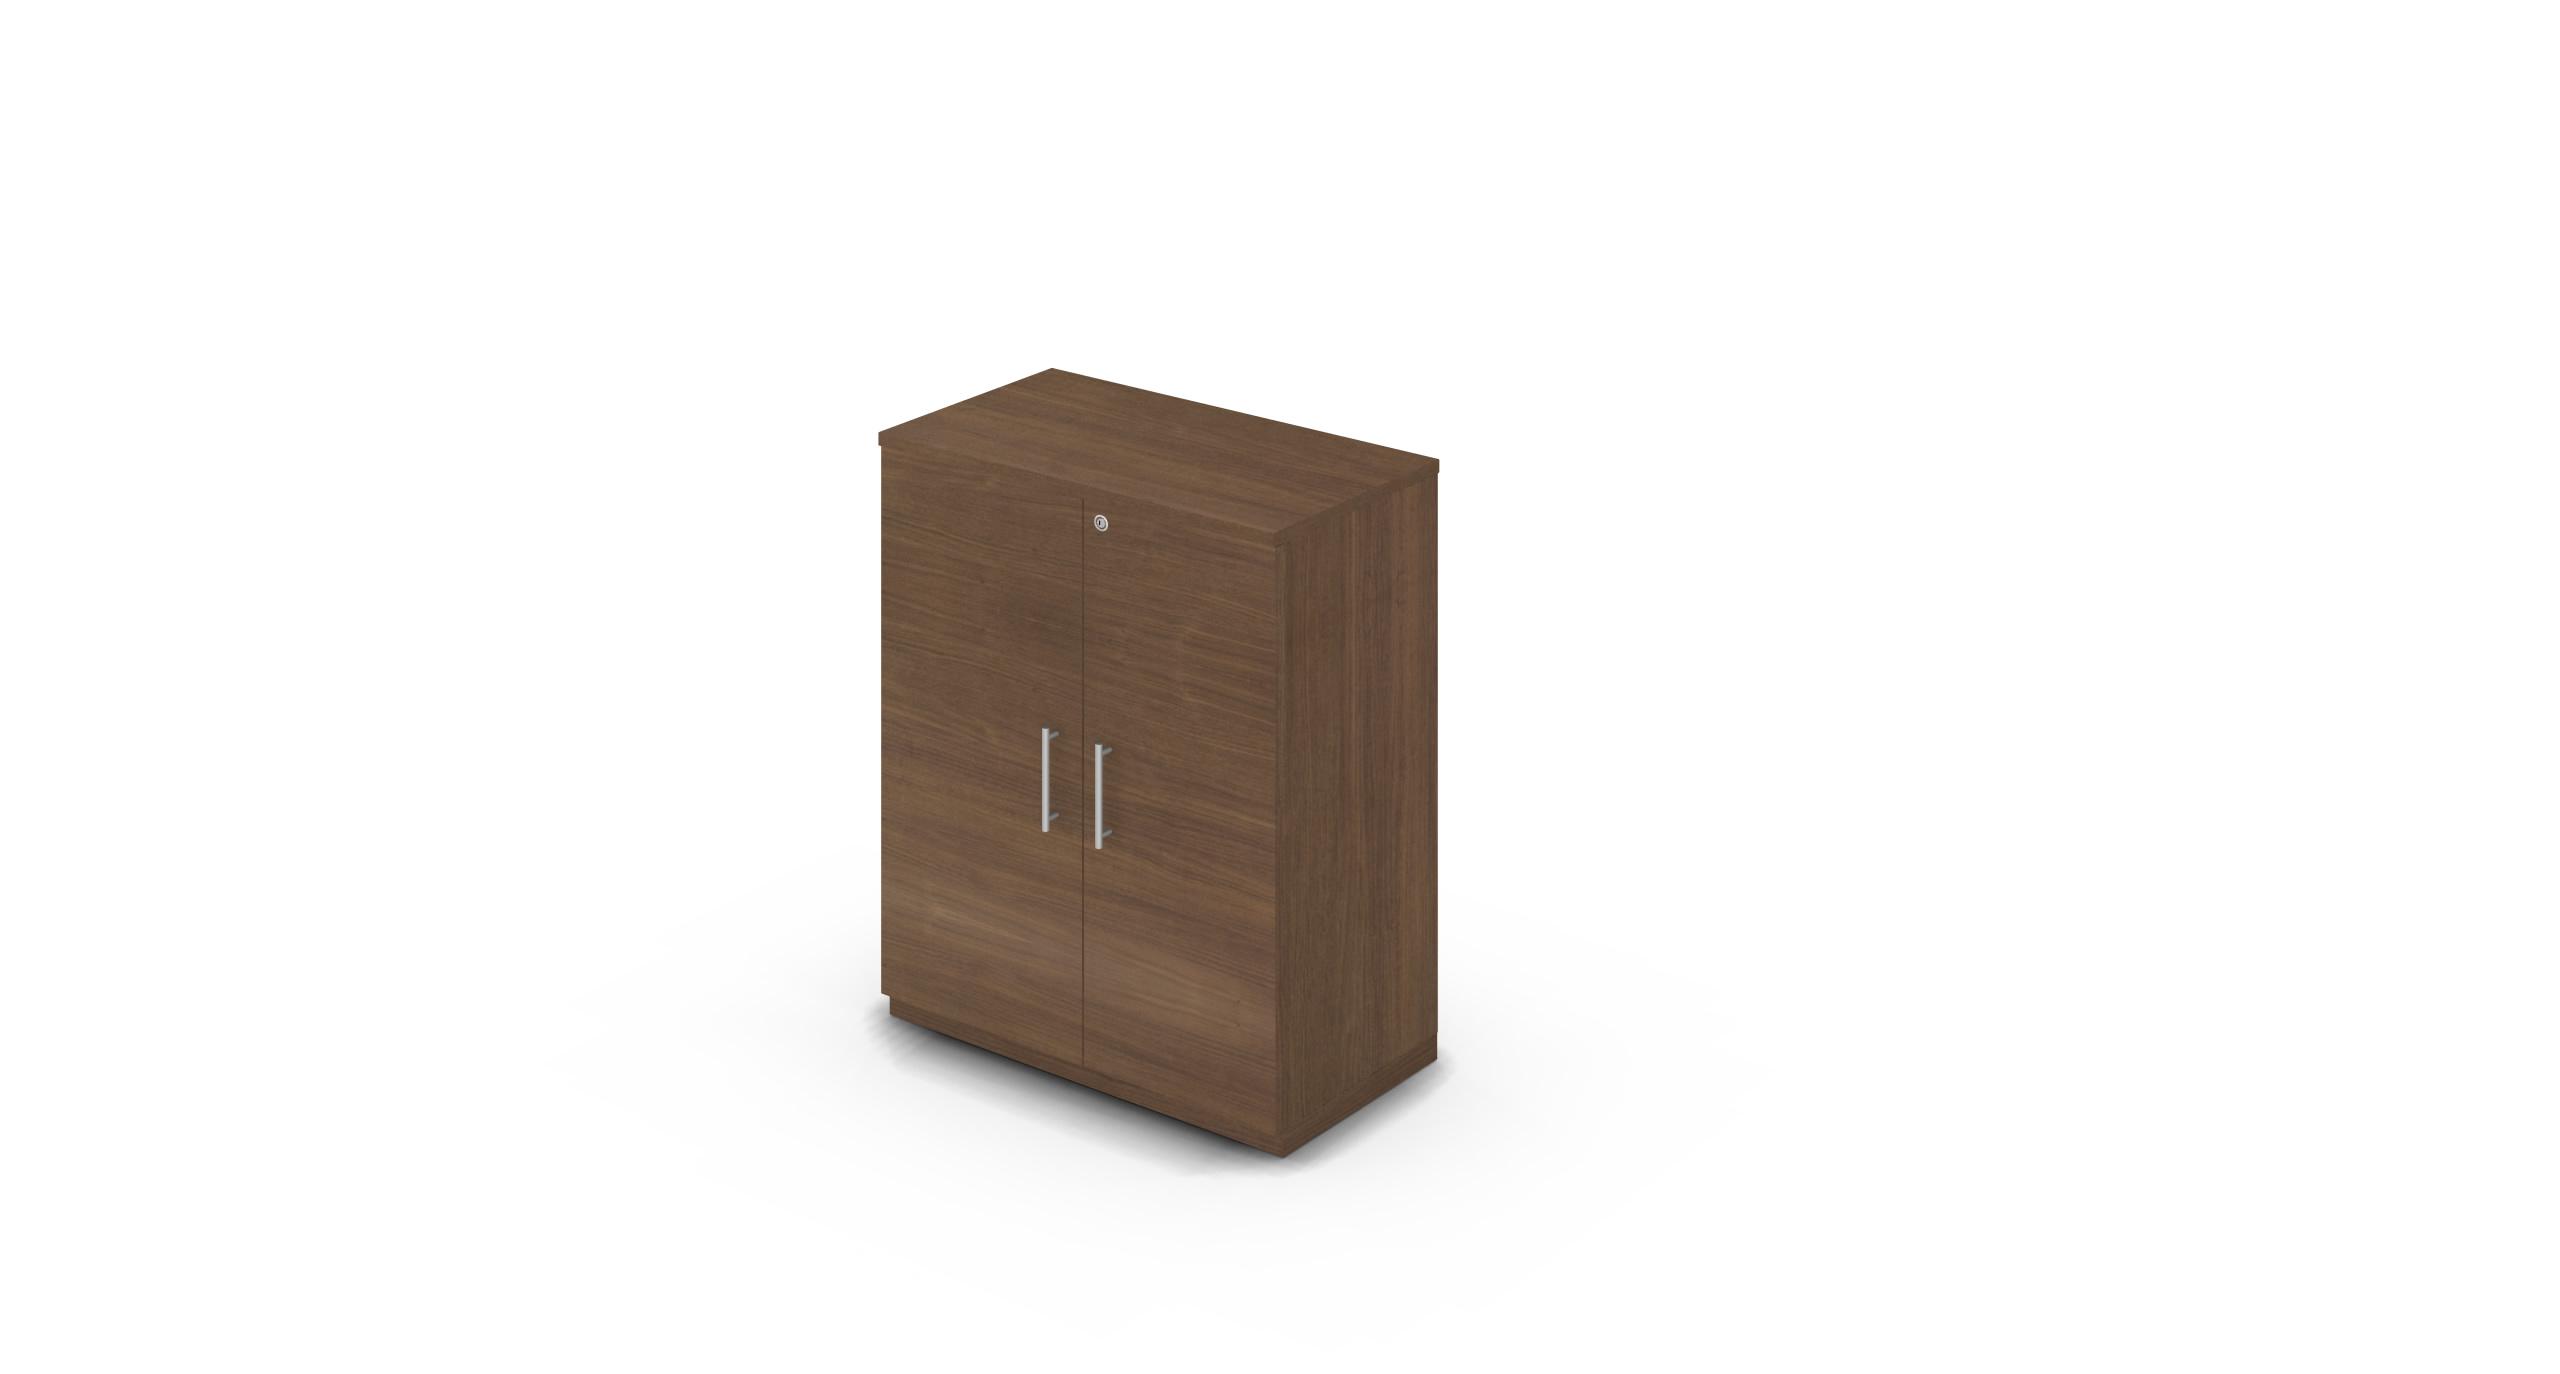 Cabinet_800x450x1125_HD_Walnut_Bar_Round_WithCylinder